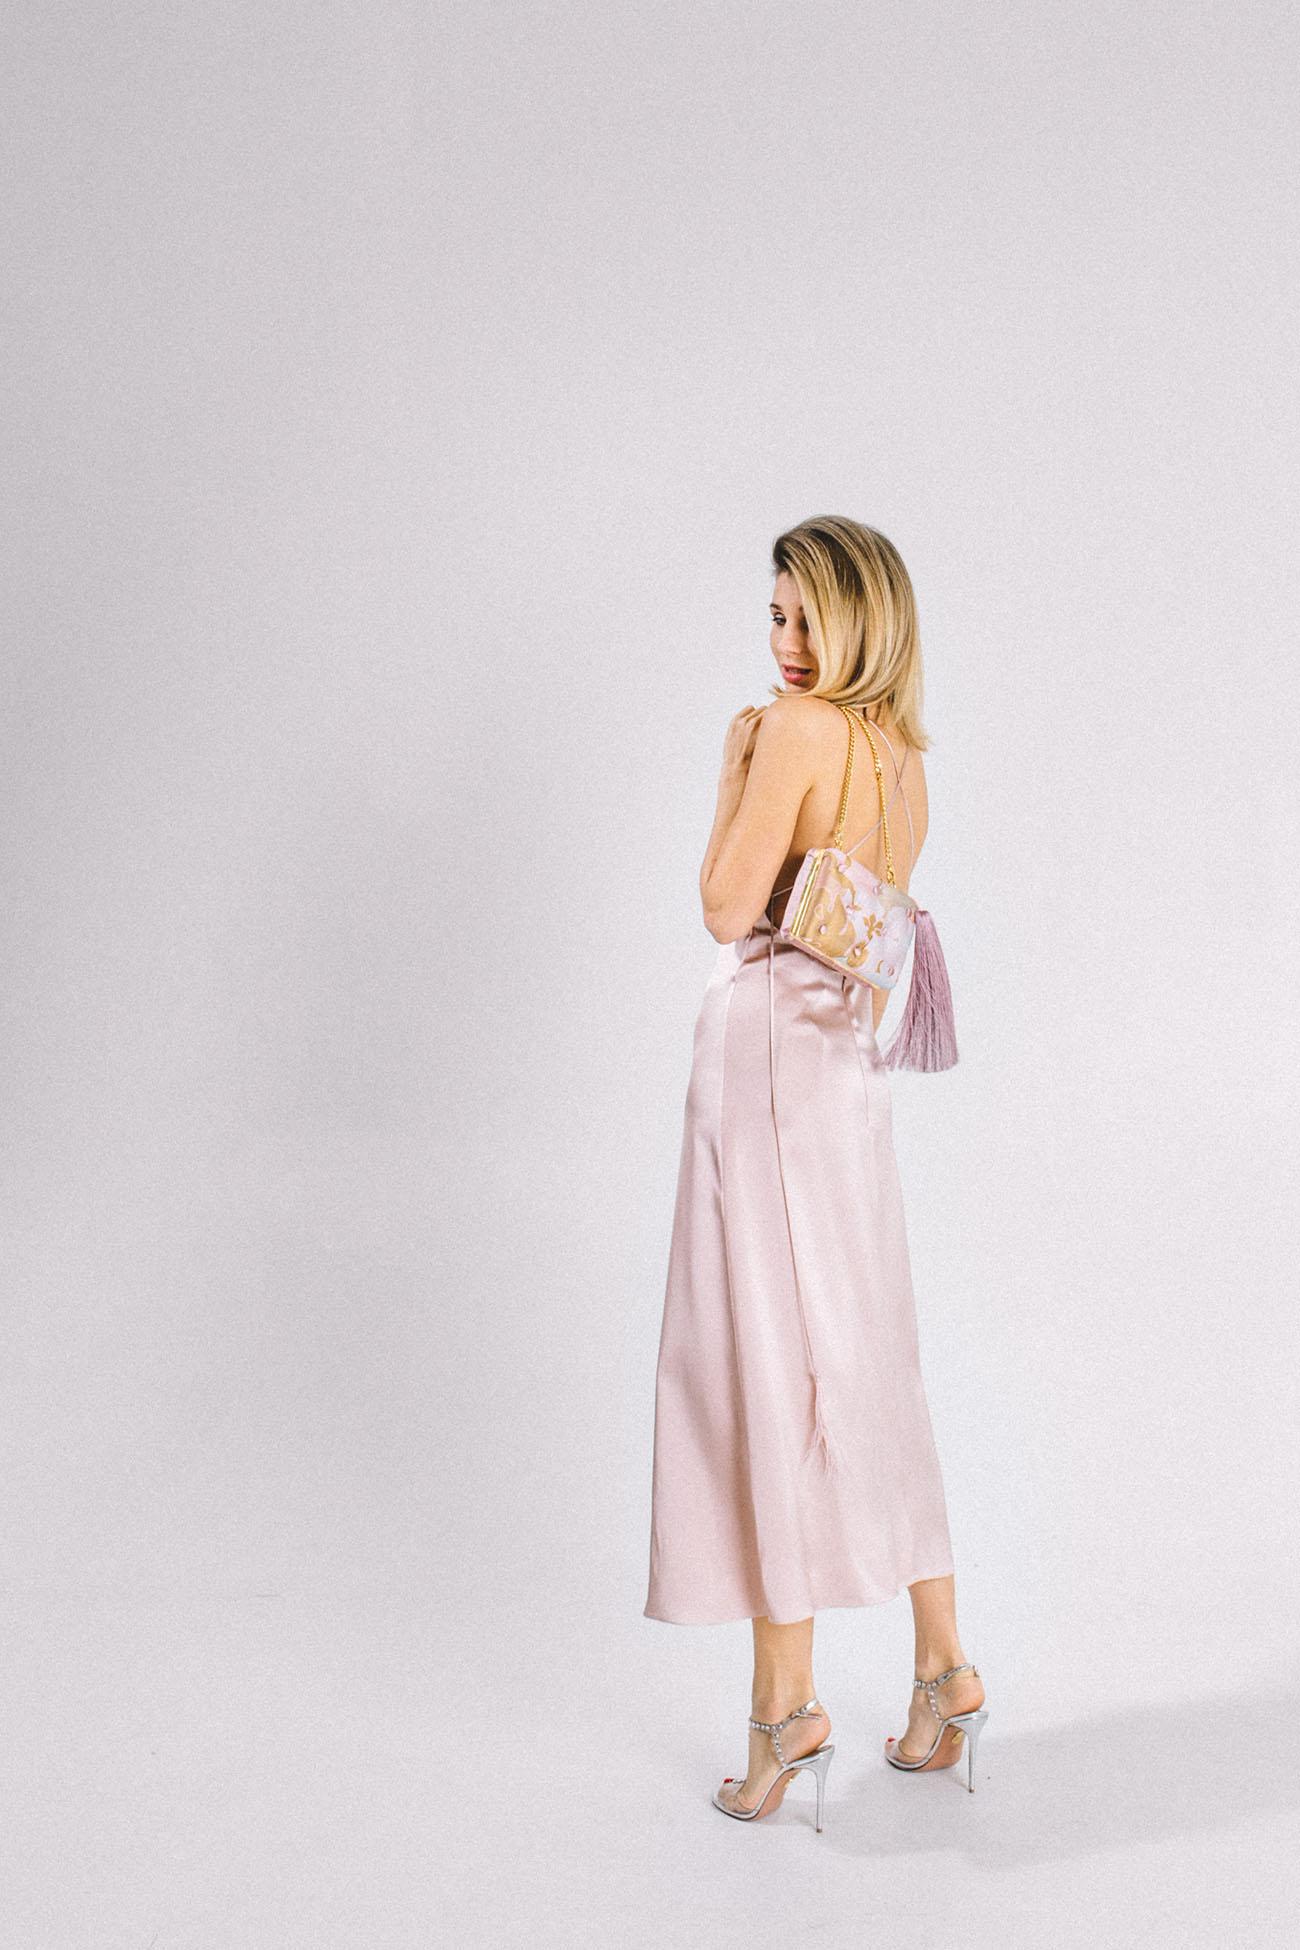 Katya Silchenko in a bias cut silk slip dress with Laimushka silk clutch bag with tassel